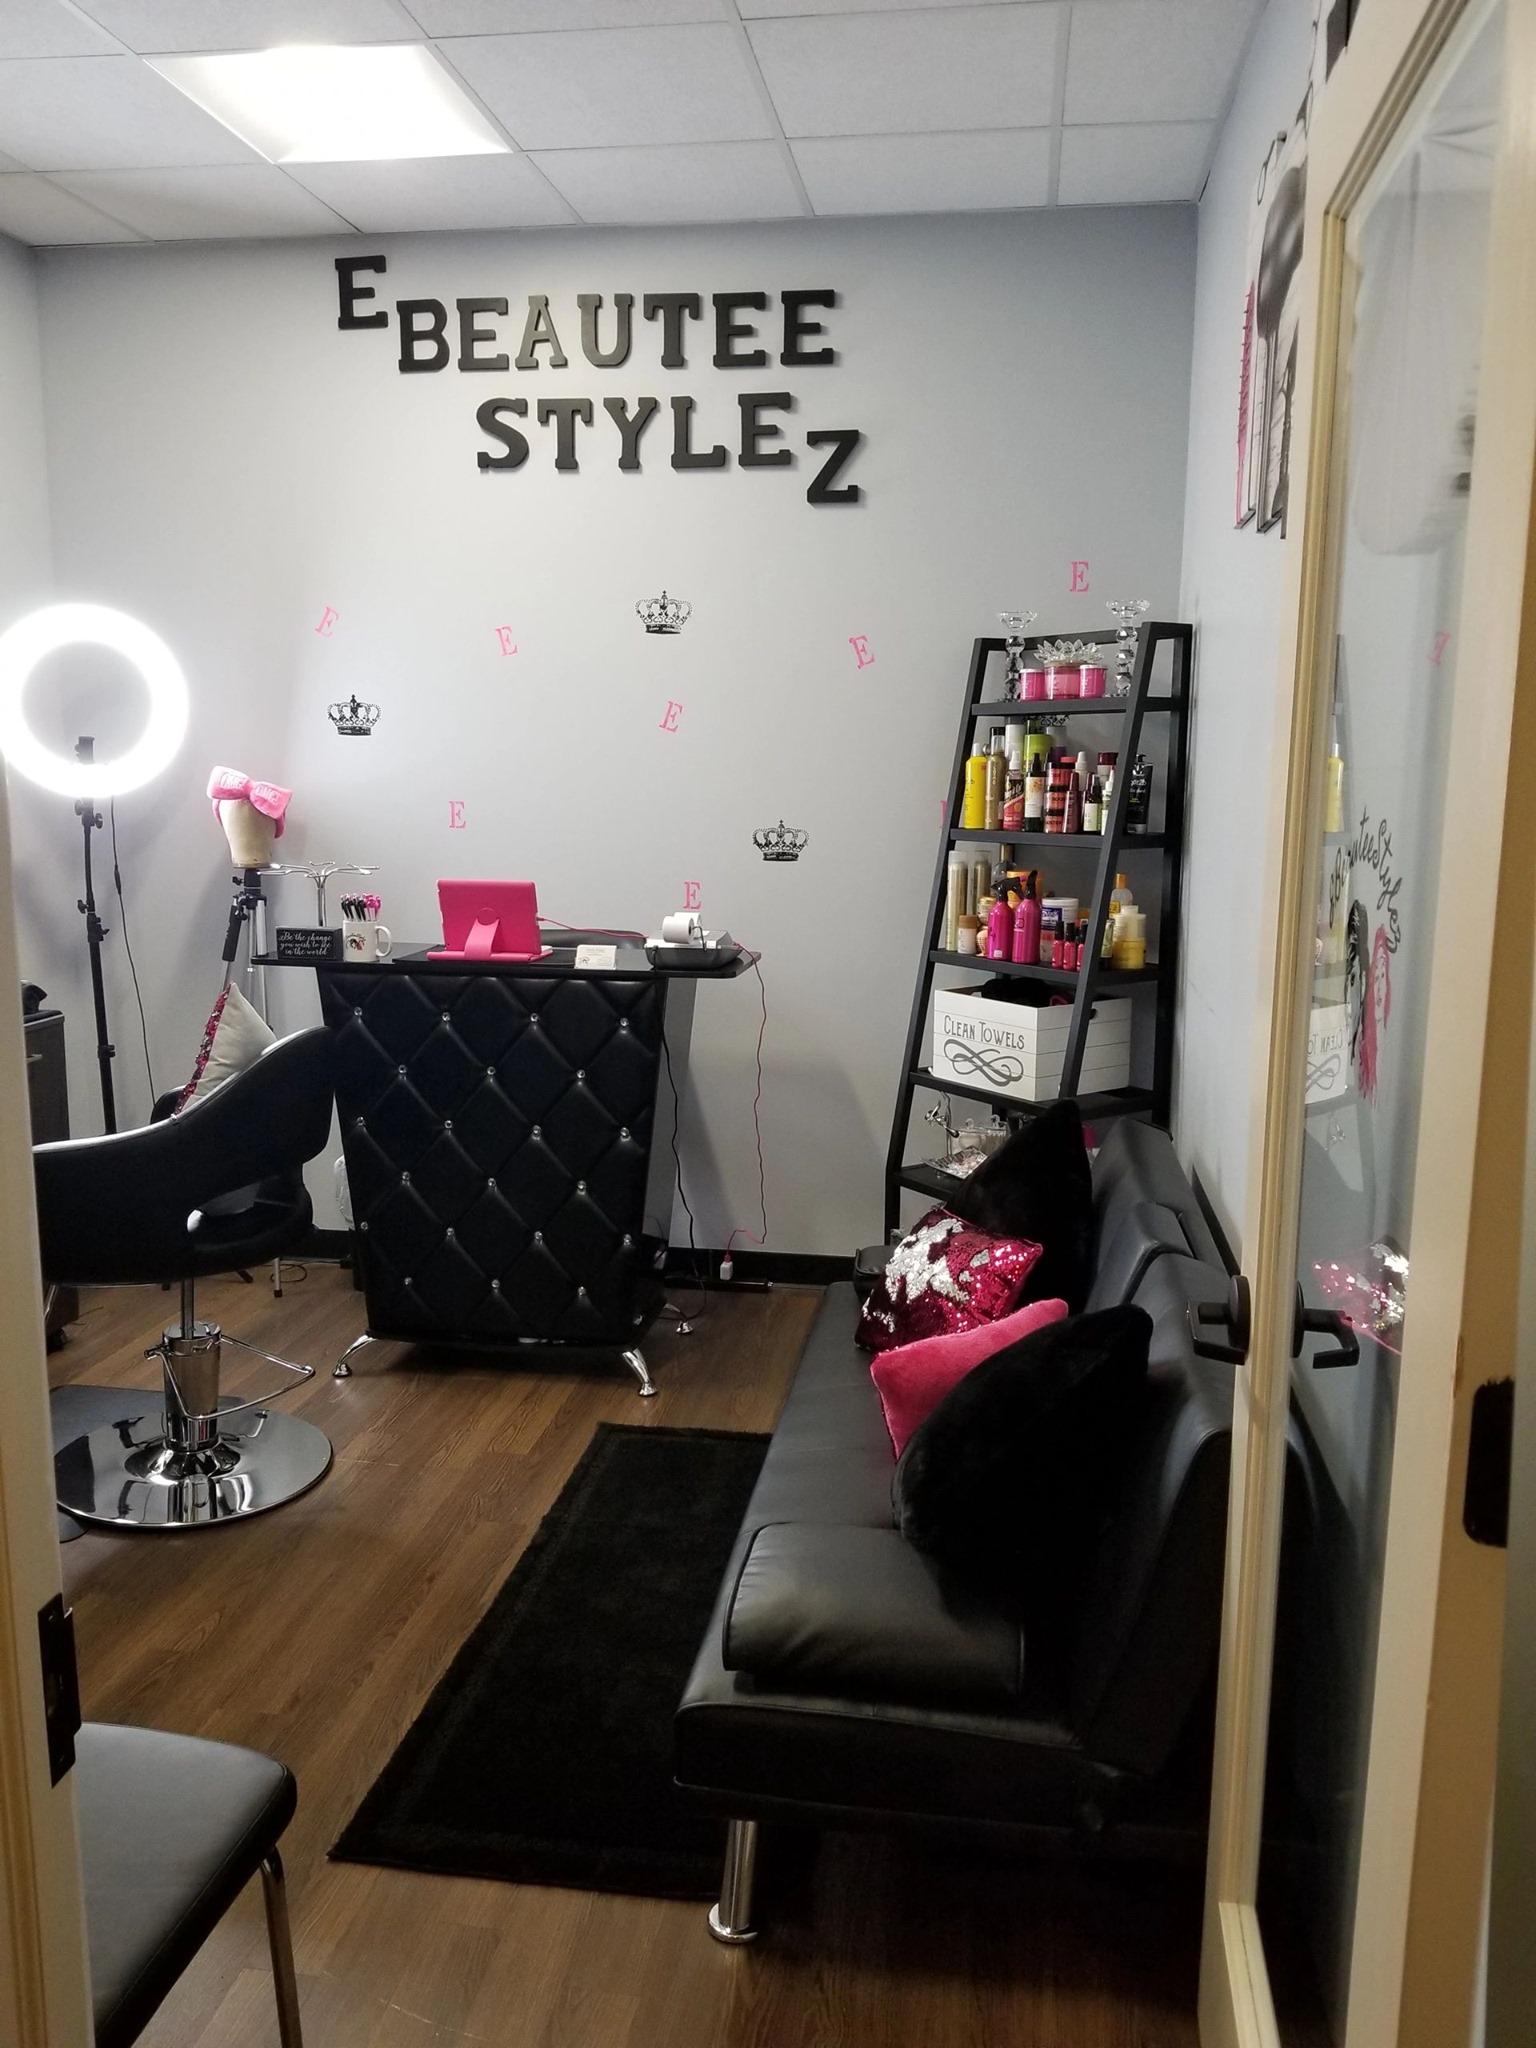 Ebeauteestylez Salon Suite